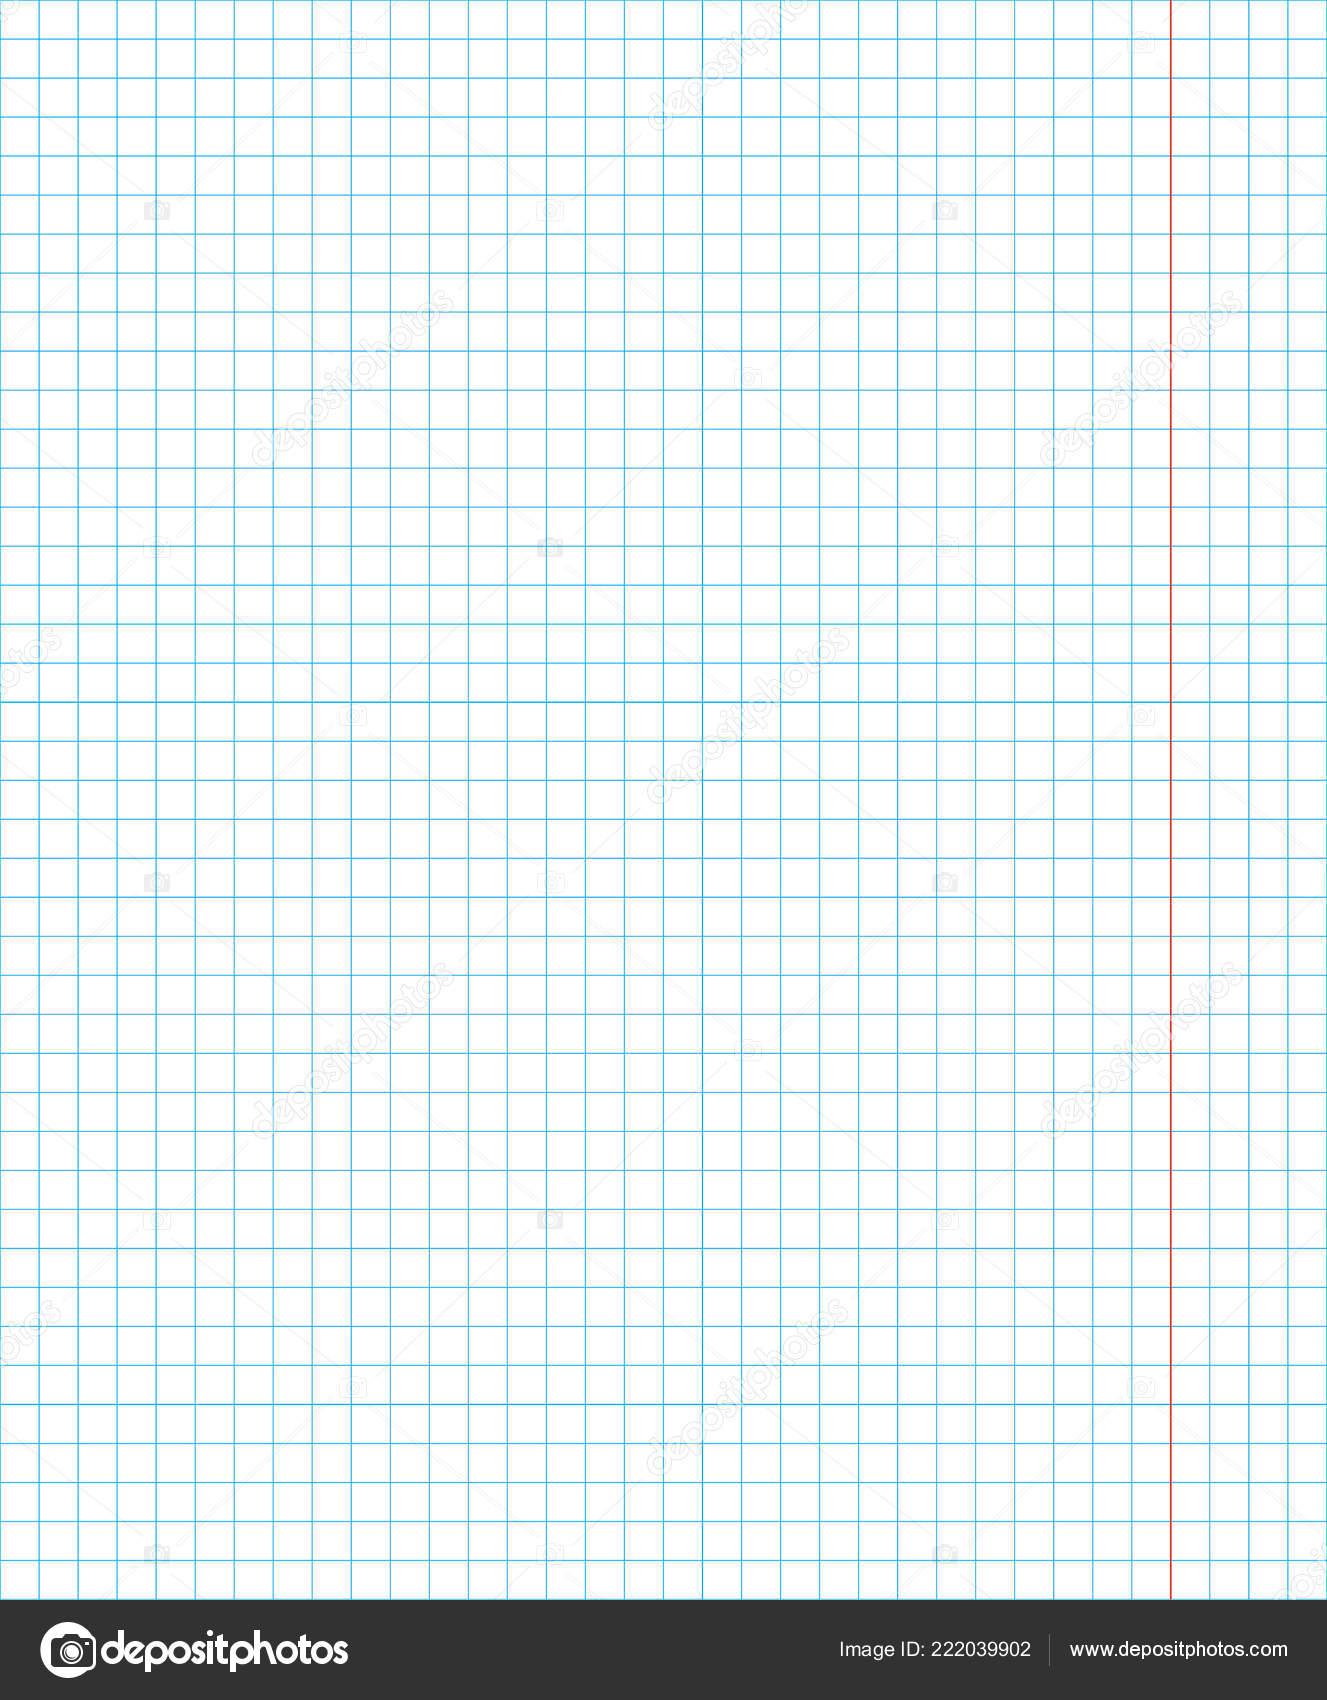 standard notebook sheet vertical cage 5 millimeter pattern of school